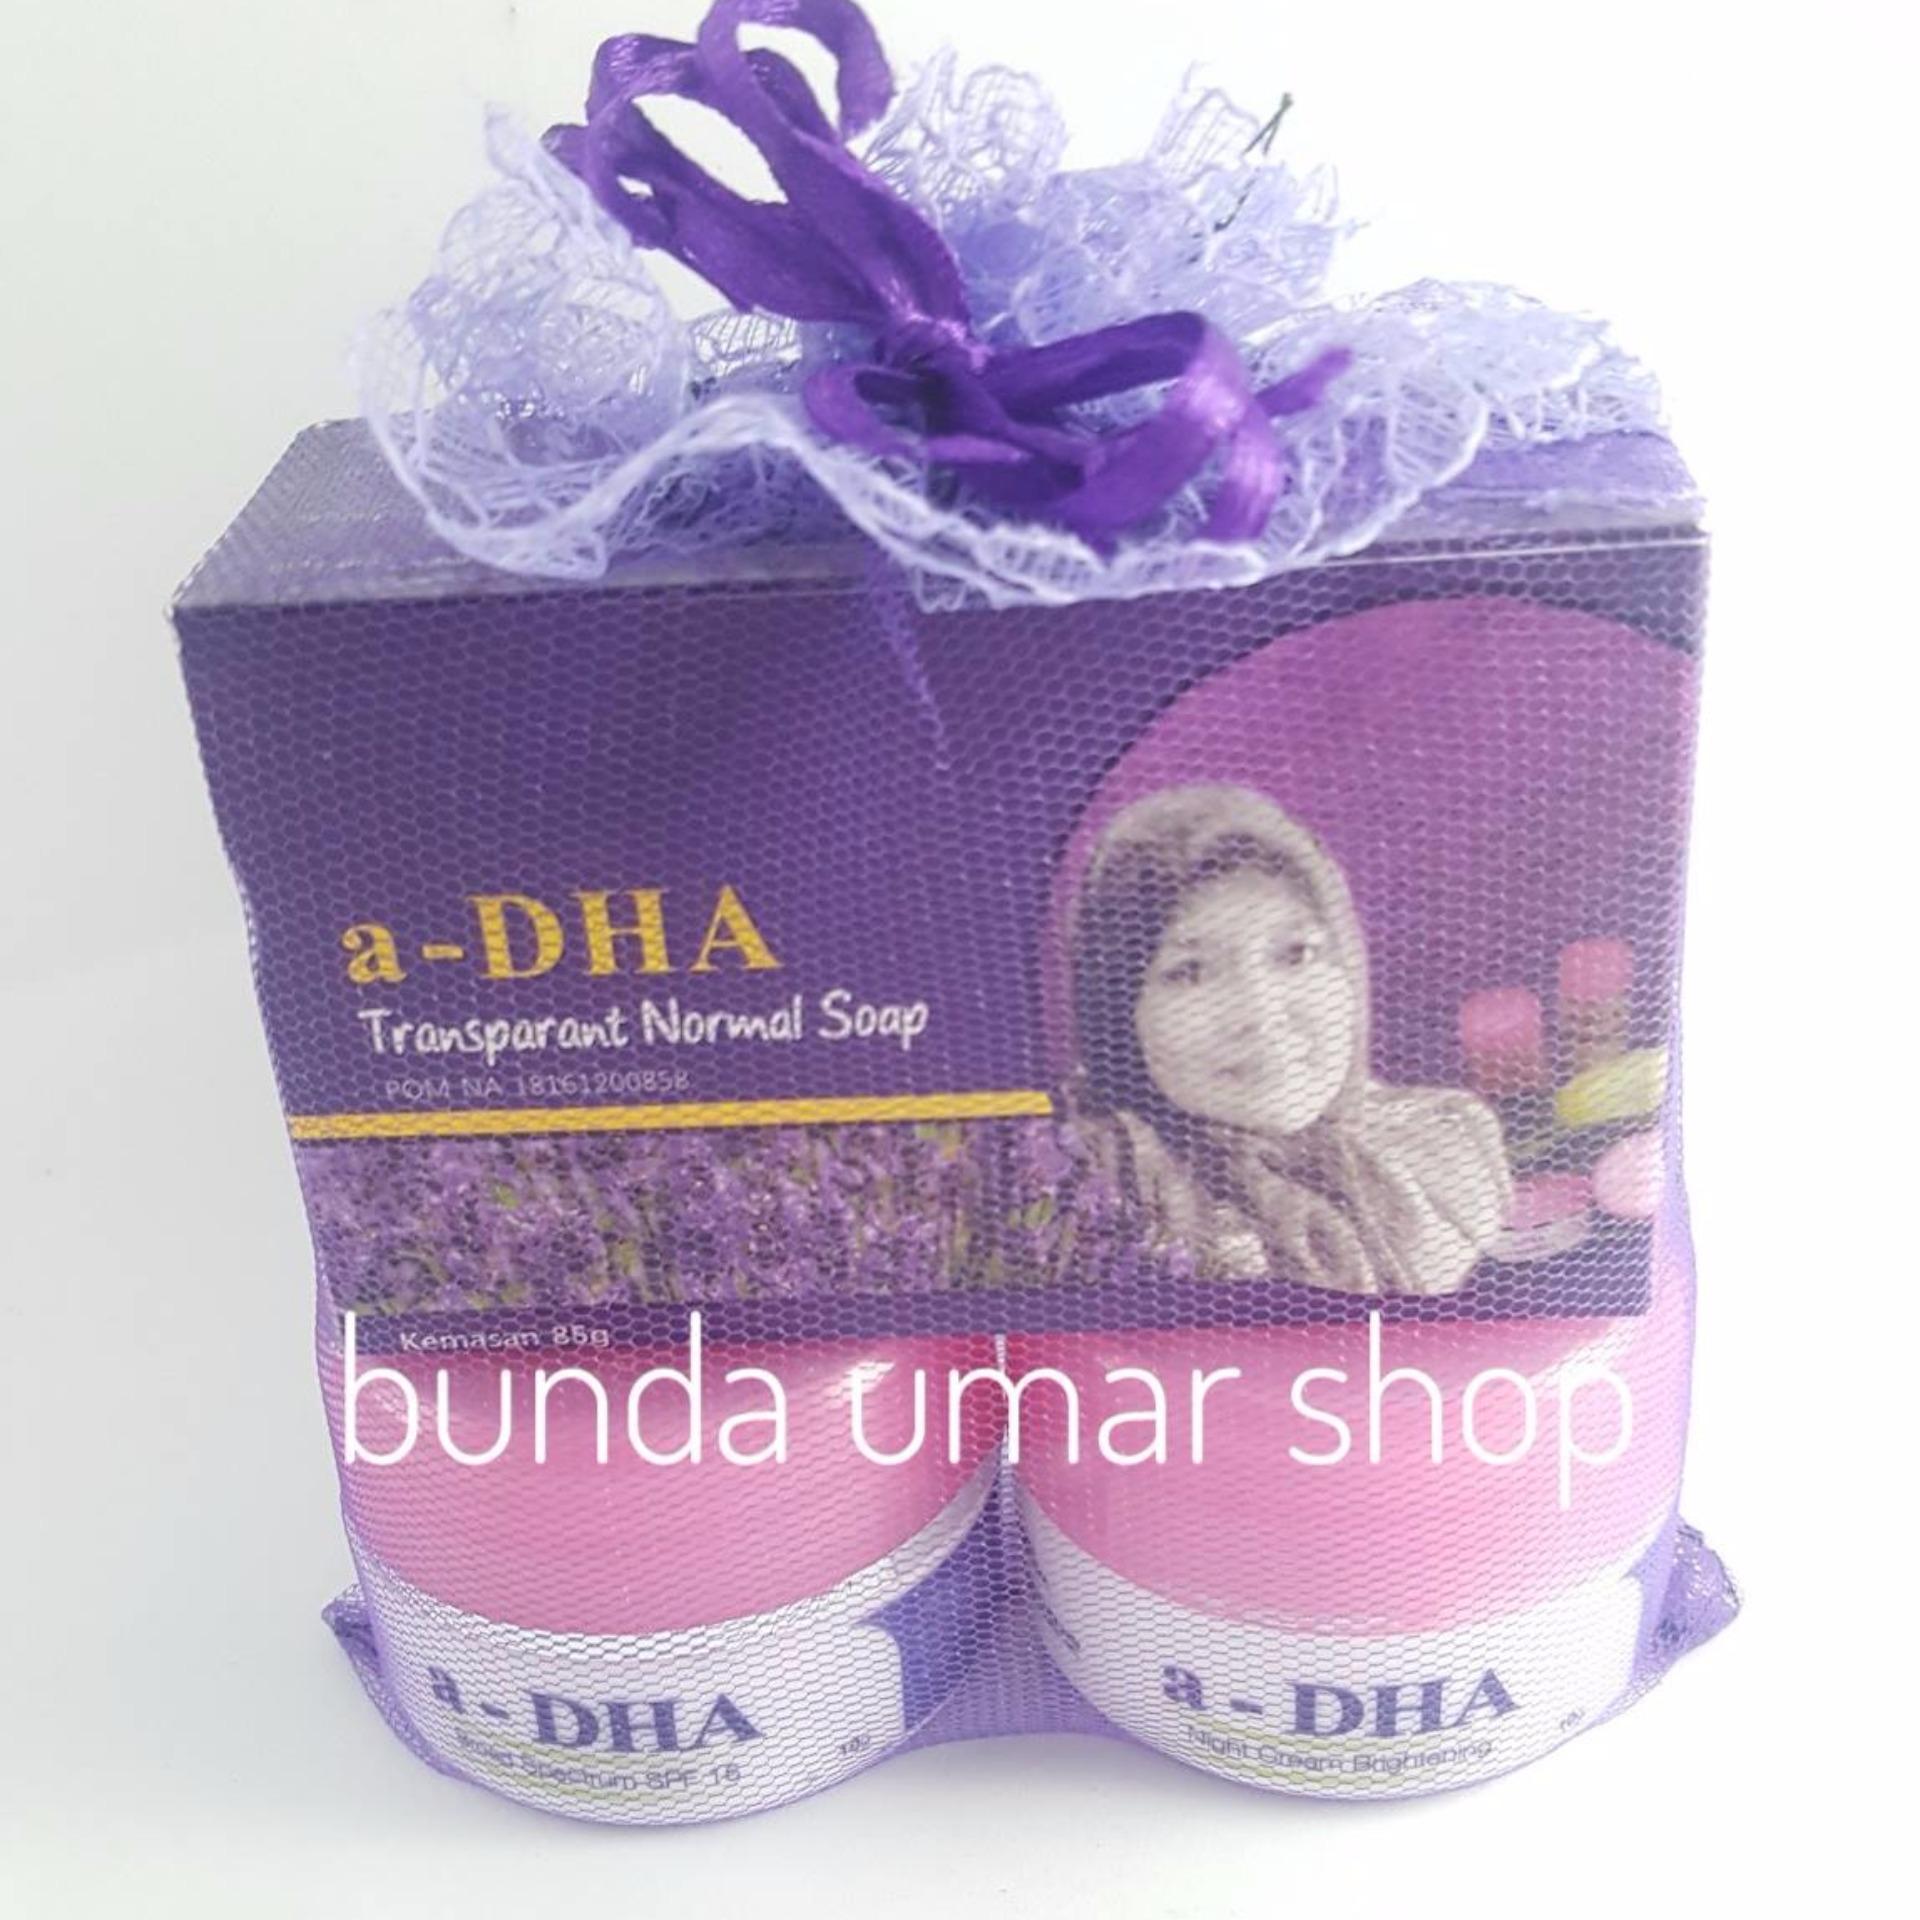 A Dha Cream Pemutih Wajah 100percent Original Adha Pink Beauty Hologram Paket Source White Series Ekonomis